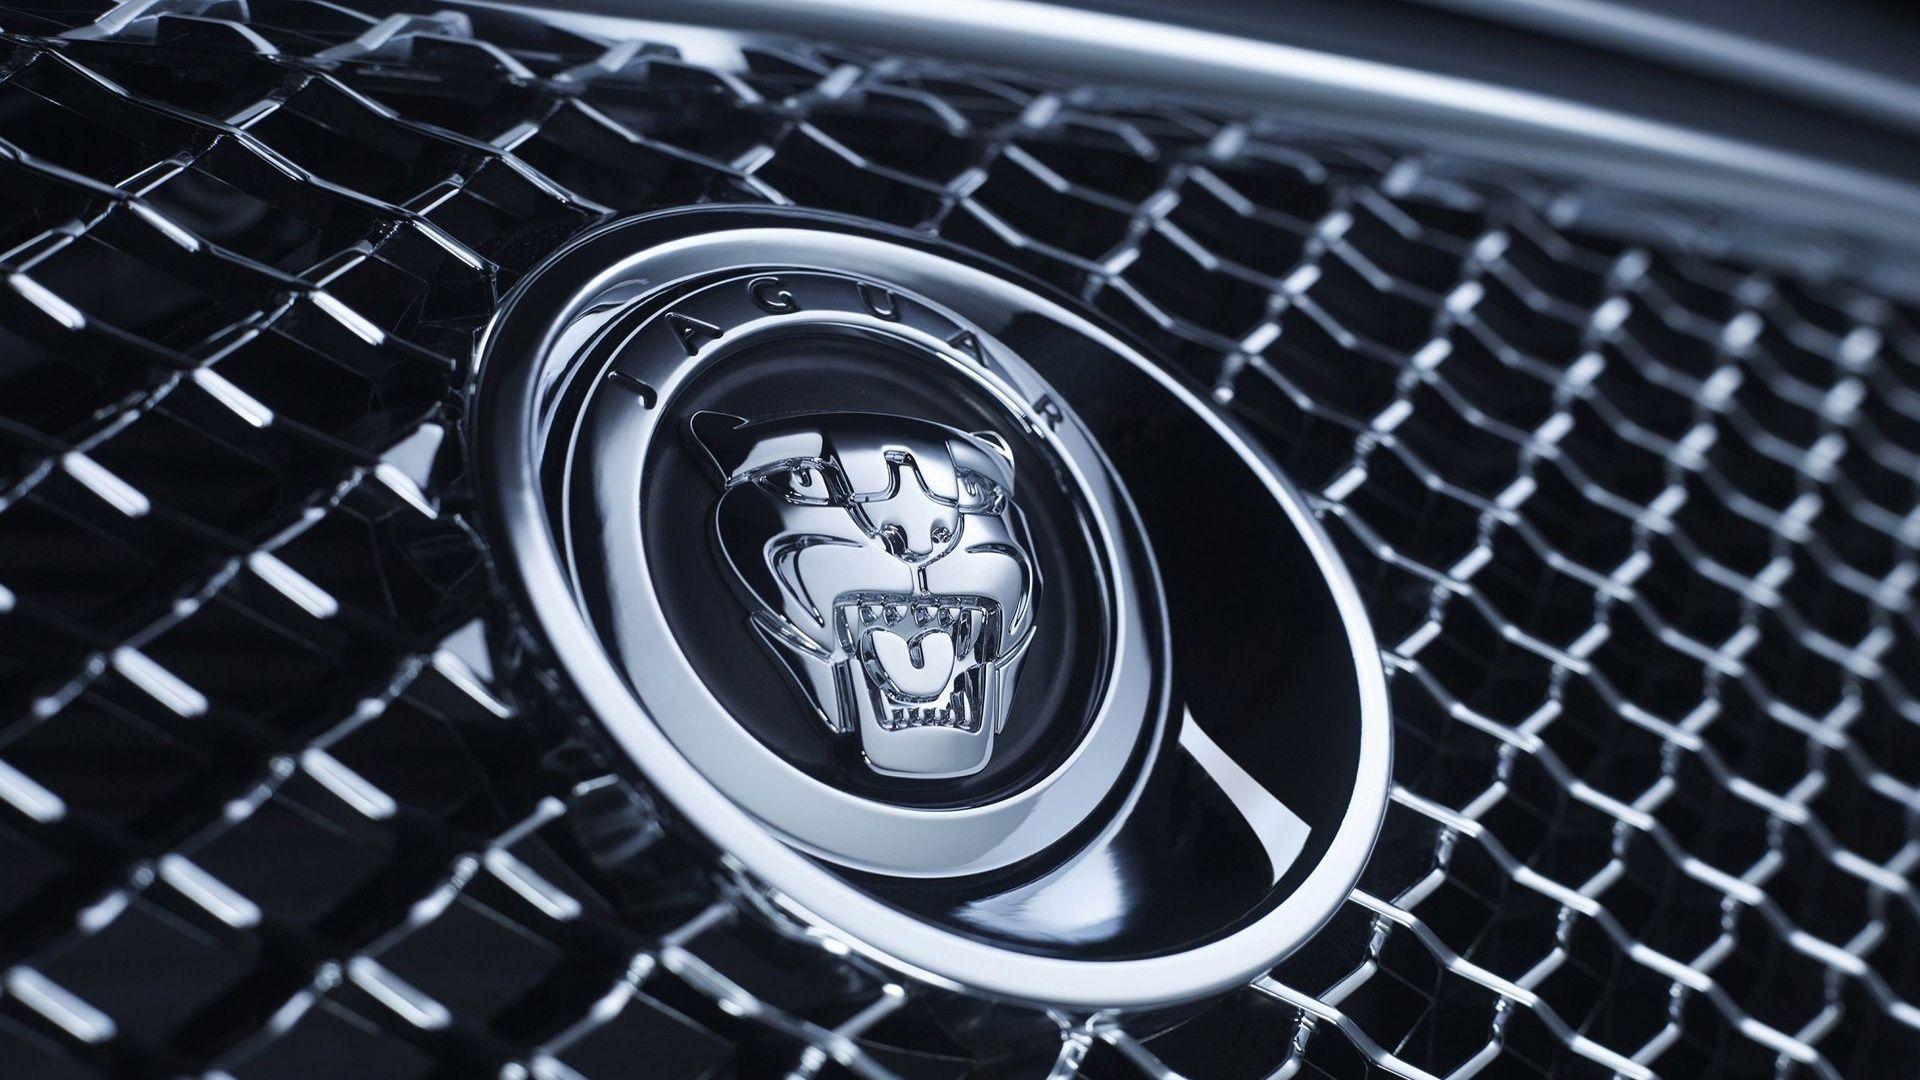 jaguar symbol 1920x1080 others pinterest